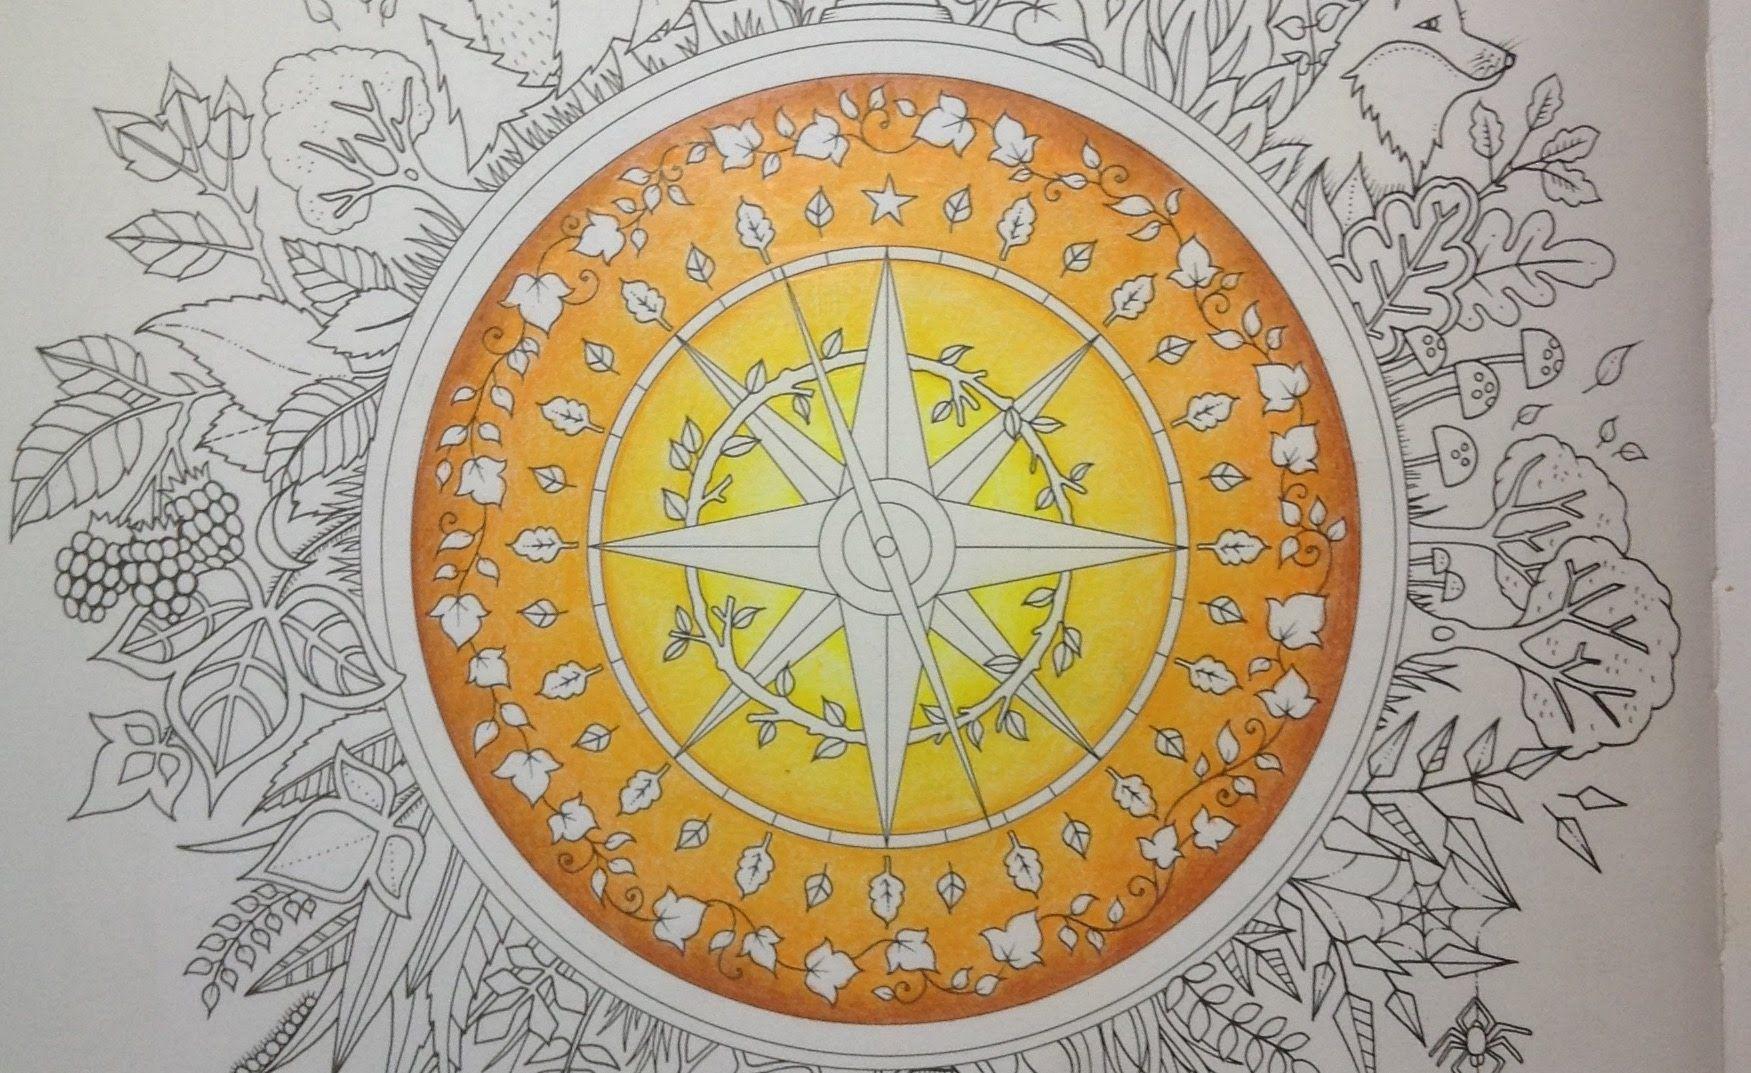 ENCHANTED FOREST Johanna Basford - color tutorial part 1